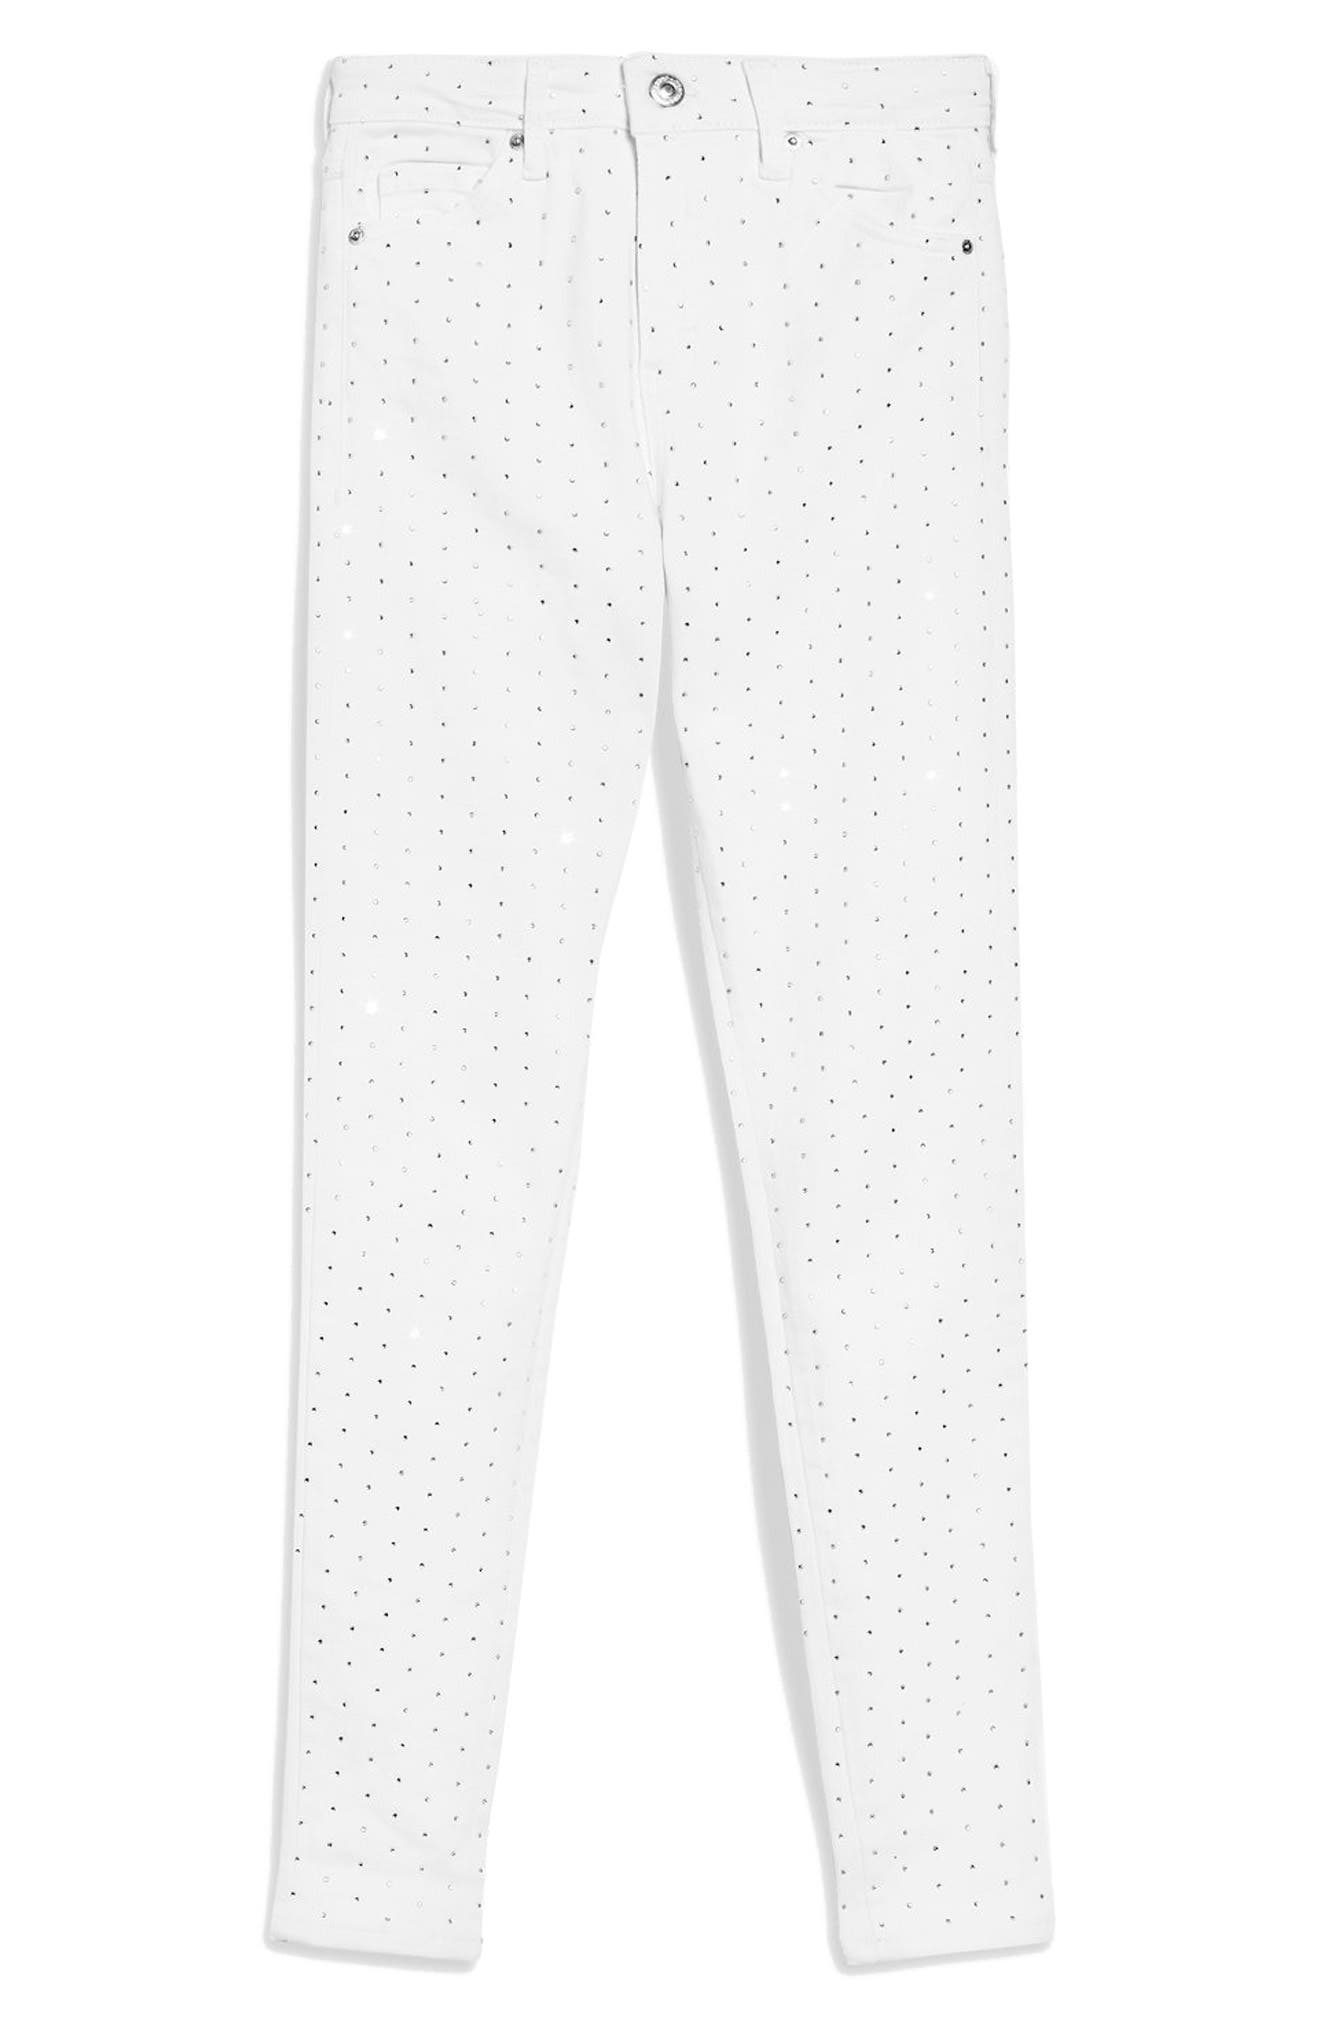 Jamie Diamante Skinny Jeans,                             Alternate thumbnail 3, color,                             White